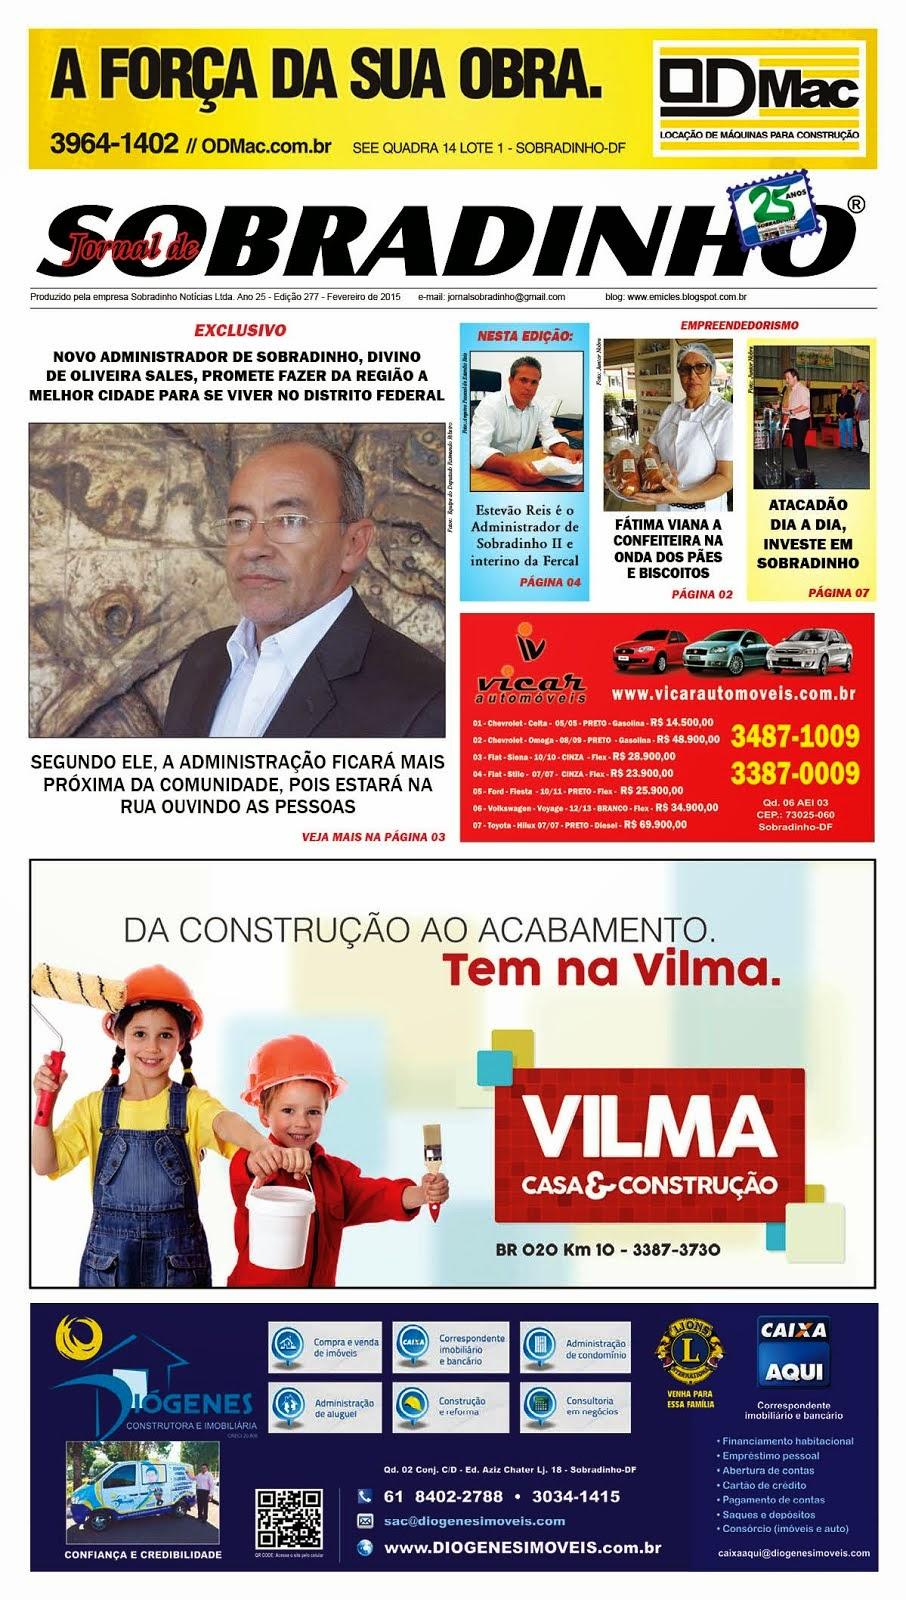 JORNAL VIRTUAL - FEVEREIRO - 2015 - Circula sempre dia 28 de cada MÊS